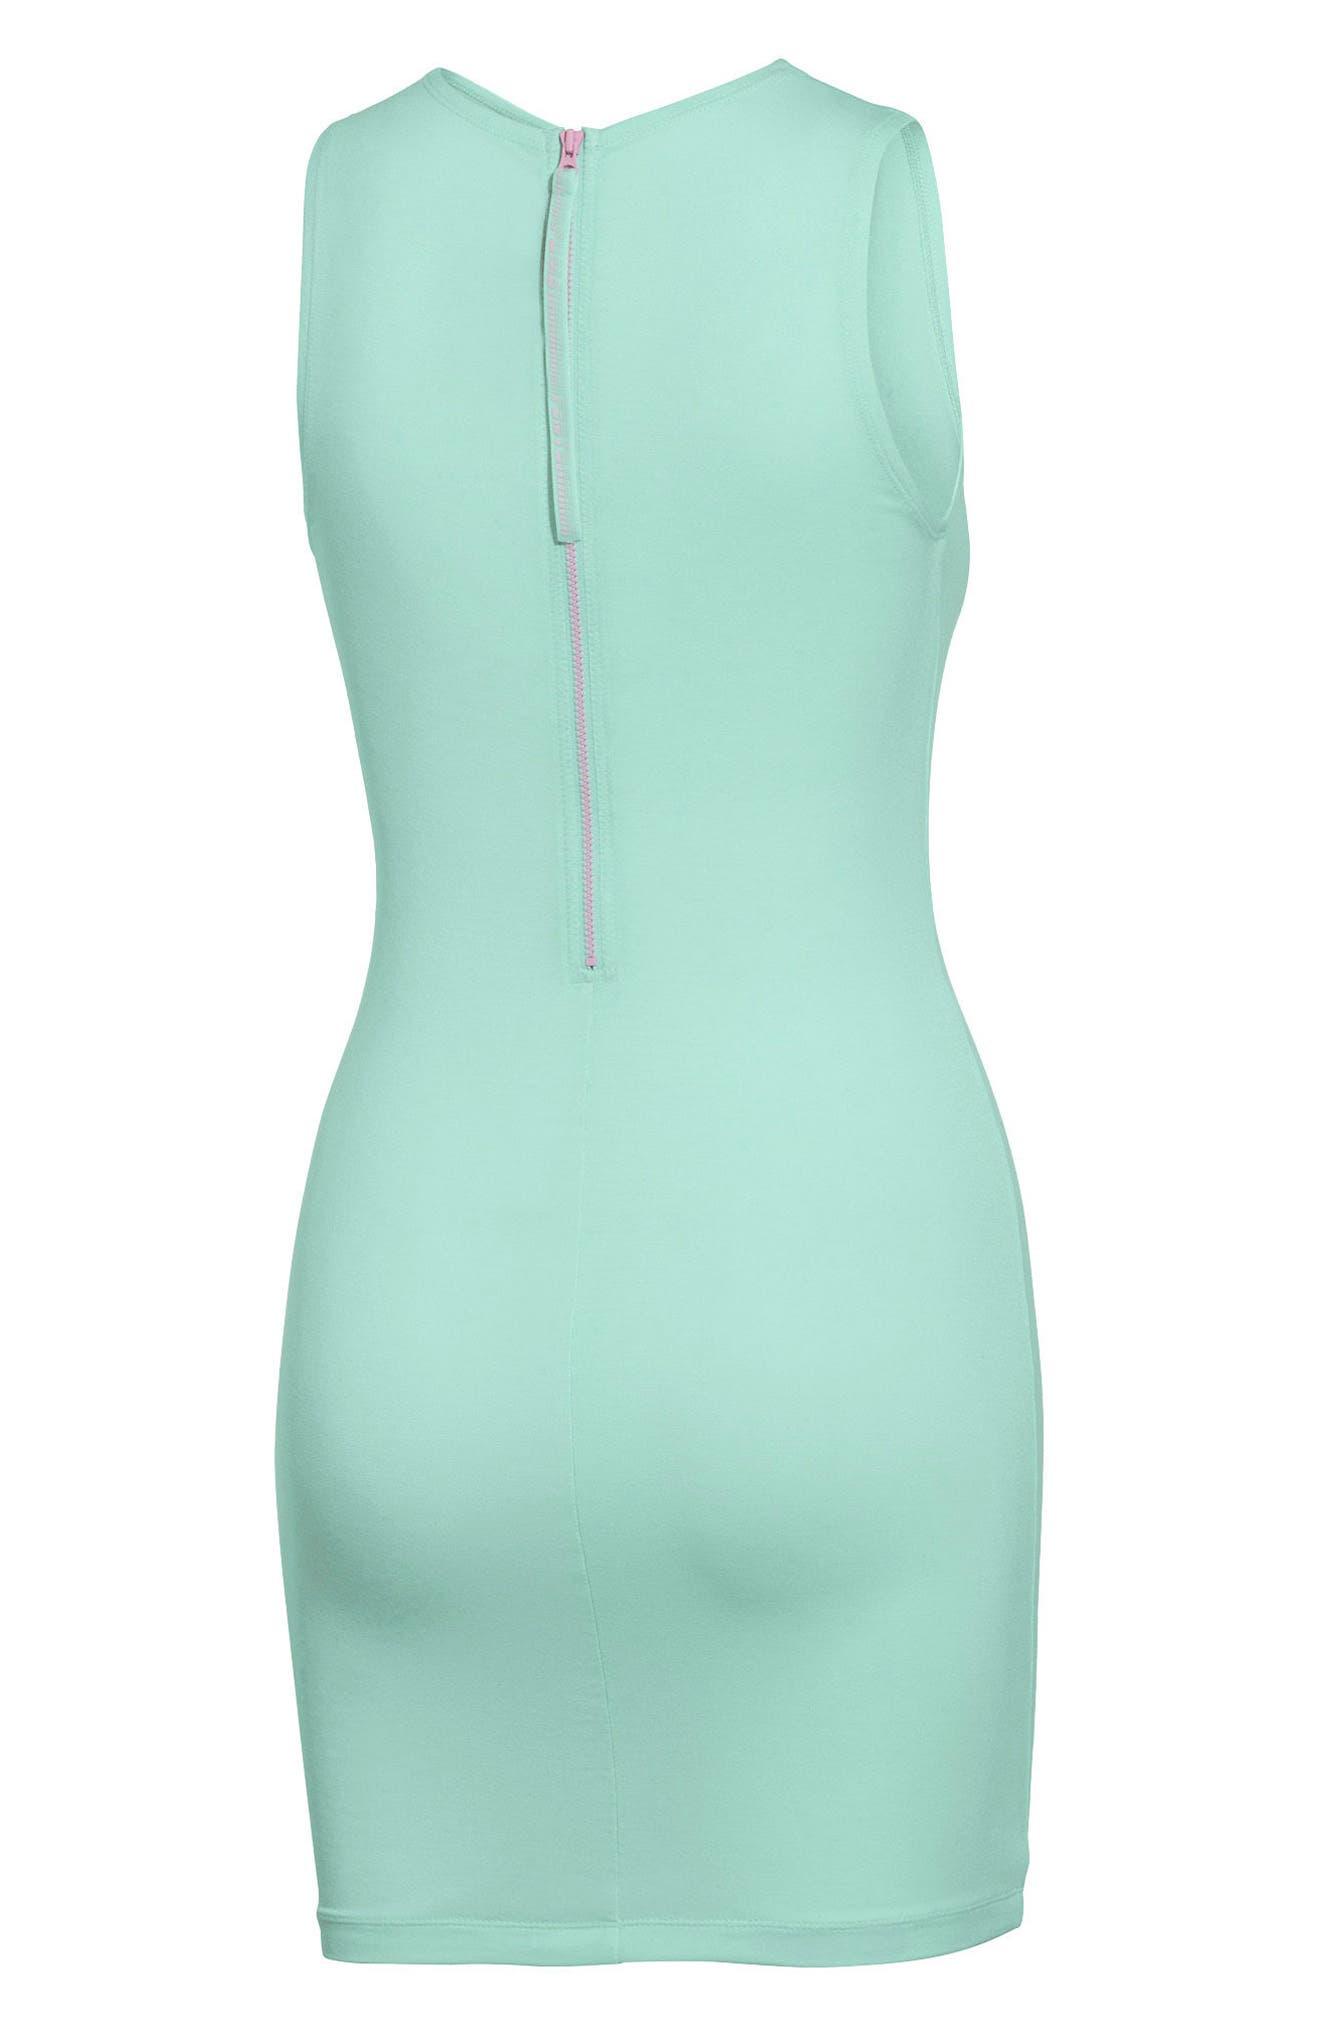 PUMA by Rihanna Body-Con Dress,                             Alternate thumbnail 2, color,                             400